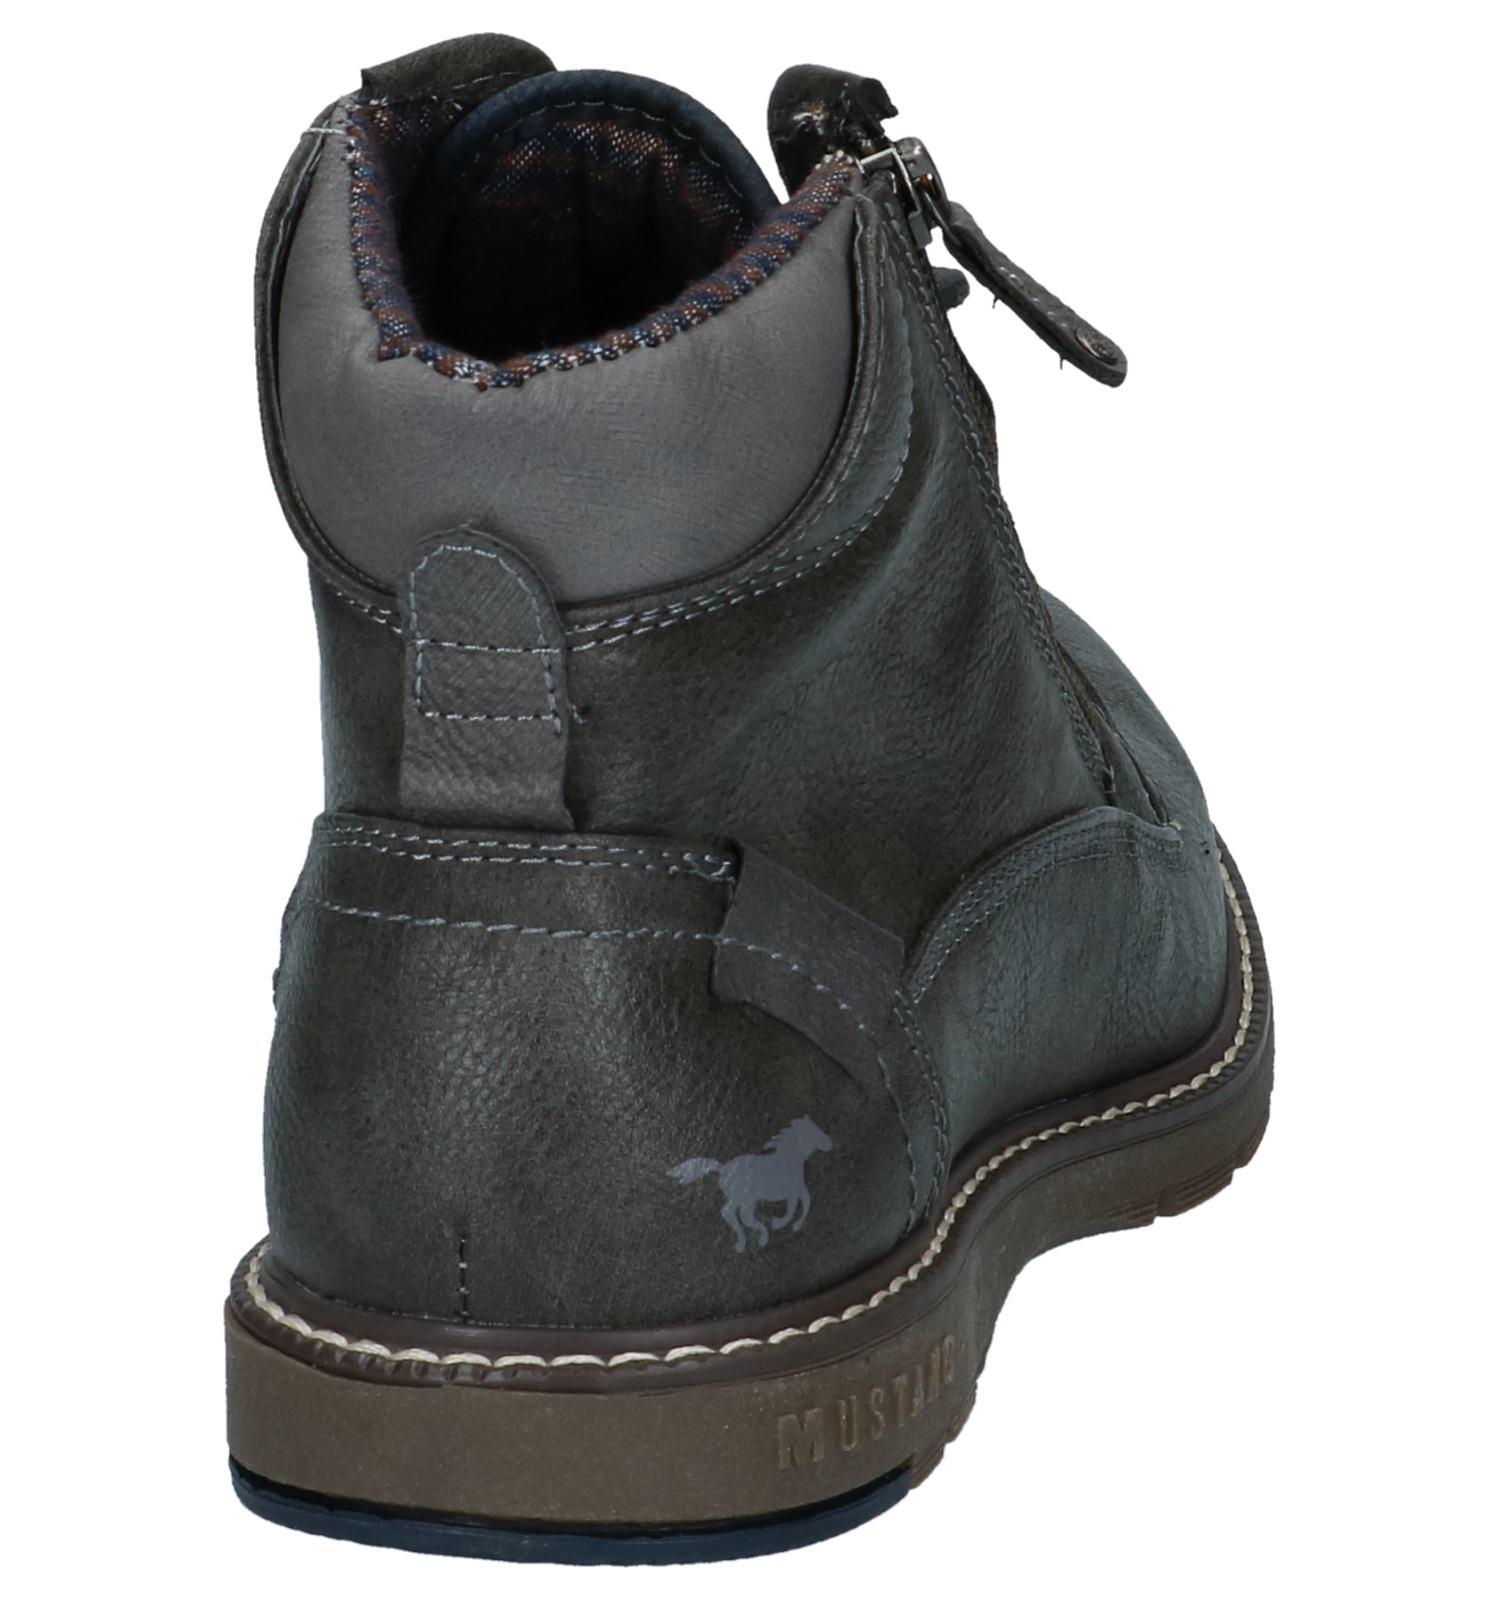 Donker Mustang Grijze Grijze Donker Boots nNOvm8w0